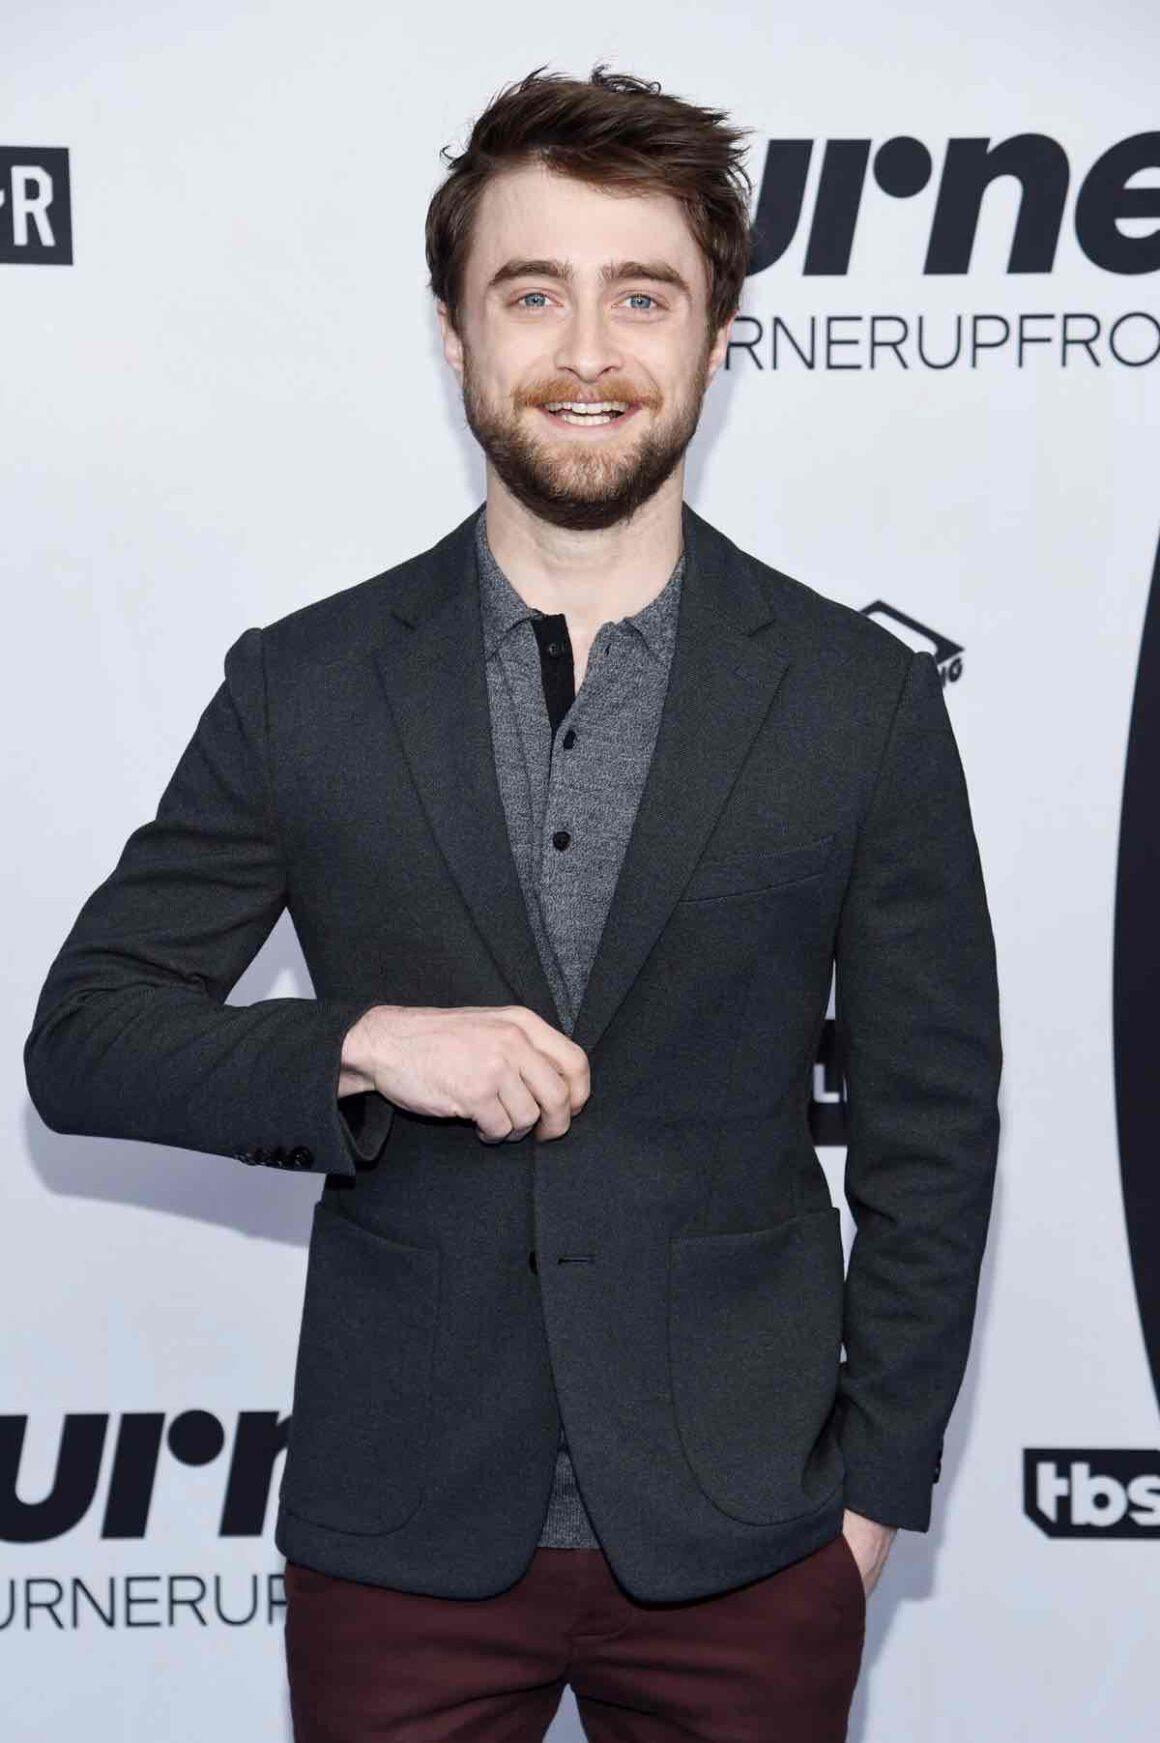 Daniel Radcliffe's Response to J.K. Rowlings Anti-Trans Tweets: 'Transgender Women Are Women' 1